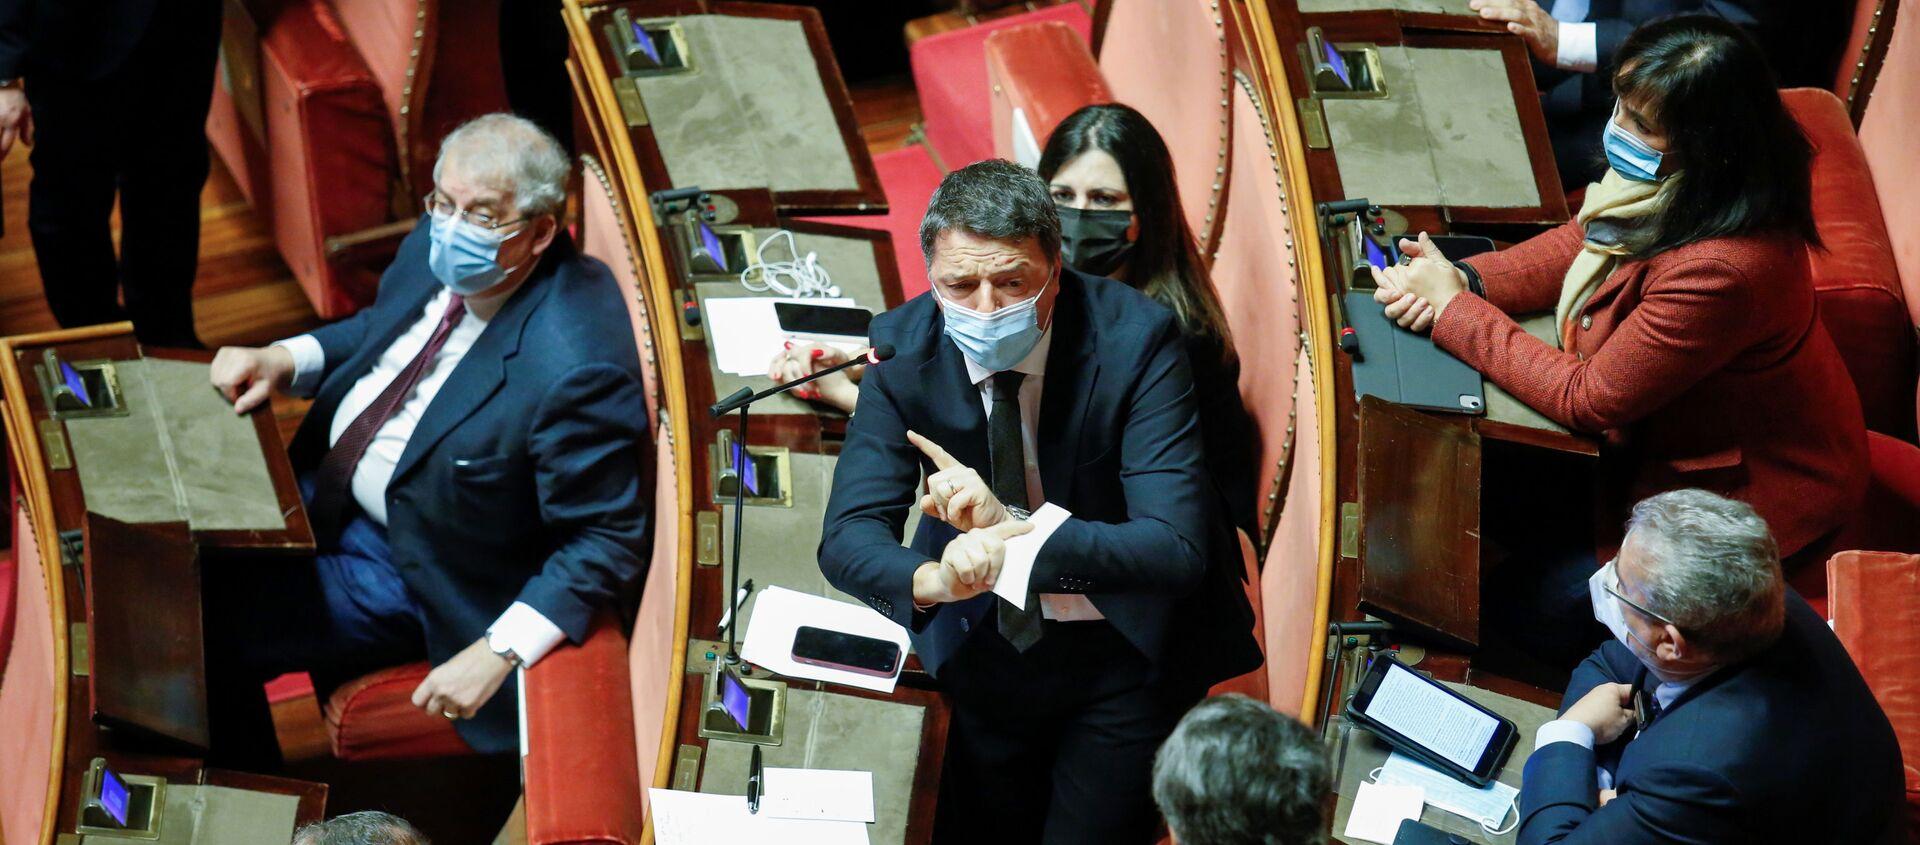 Matteo Renzi, líder del partido político Italia Viva - Sputnik Mundo, 1920, 14.01.2021